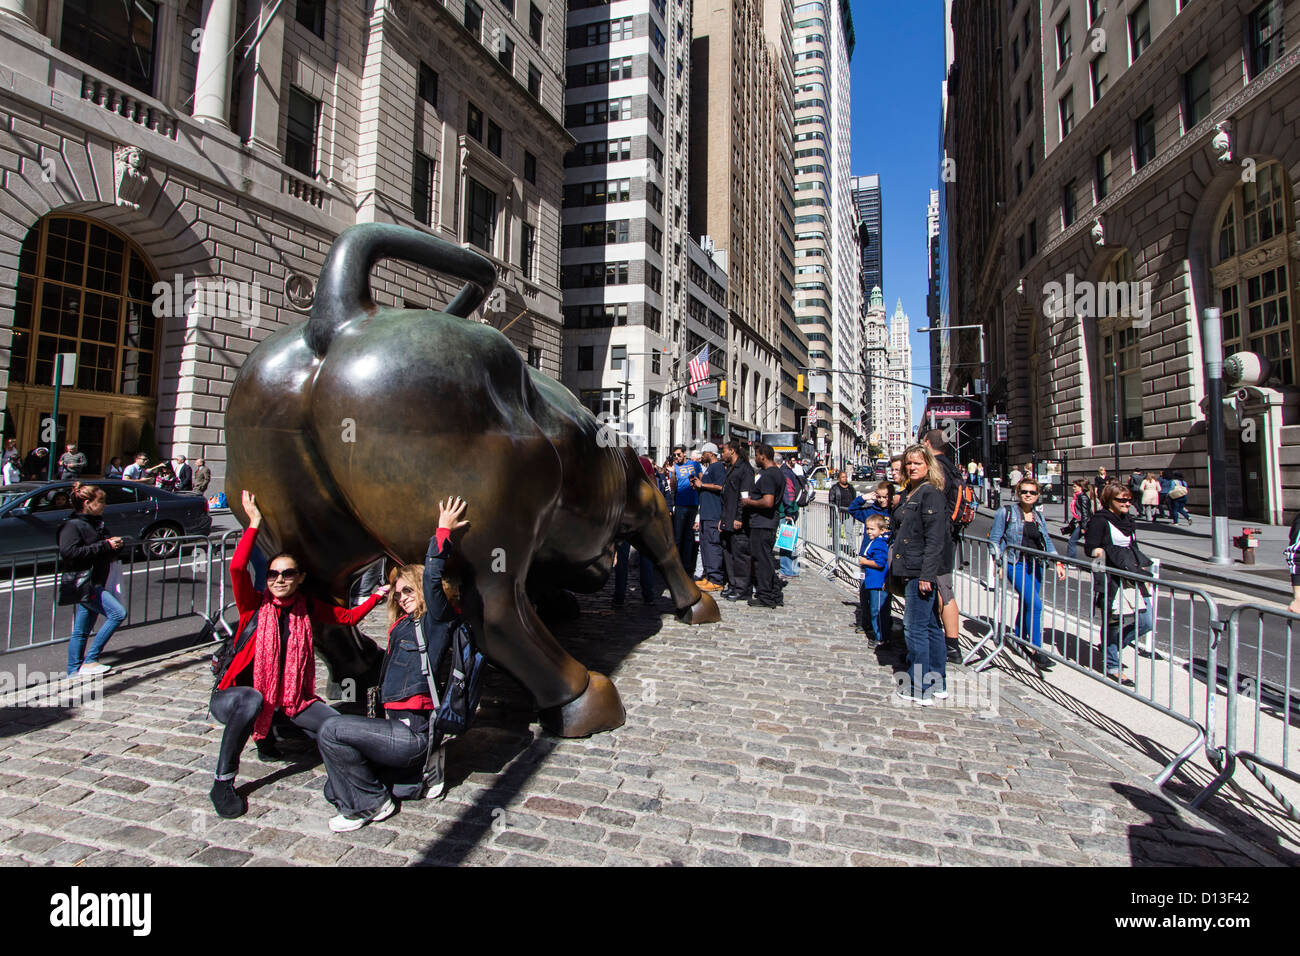 Les touristes au taureau de Wall Street, financial district, New York City, USA Photo Stock